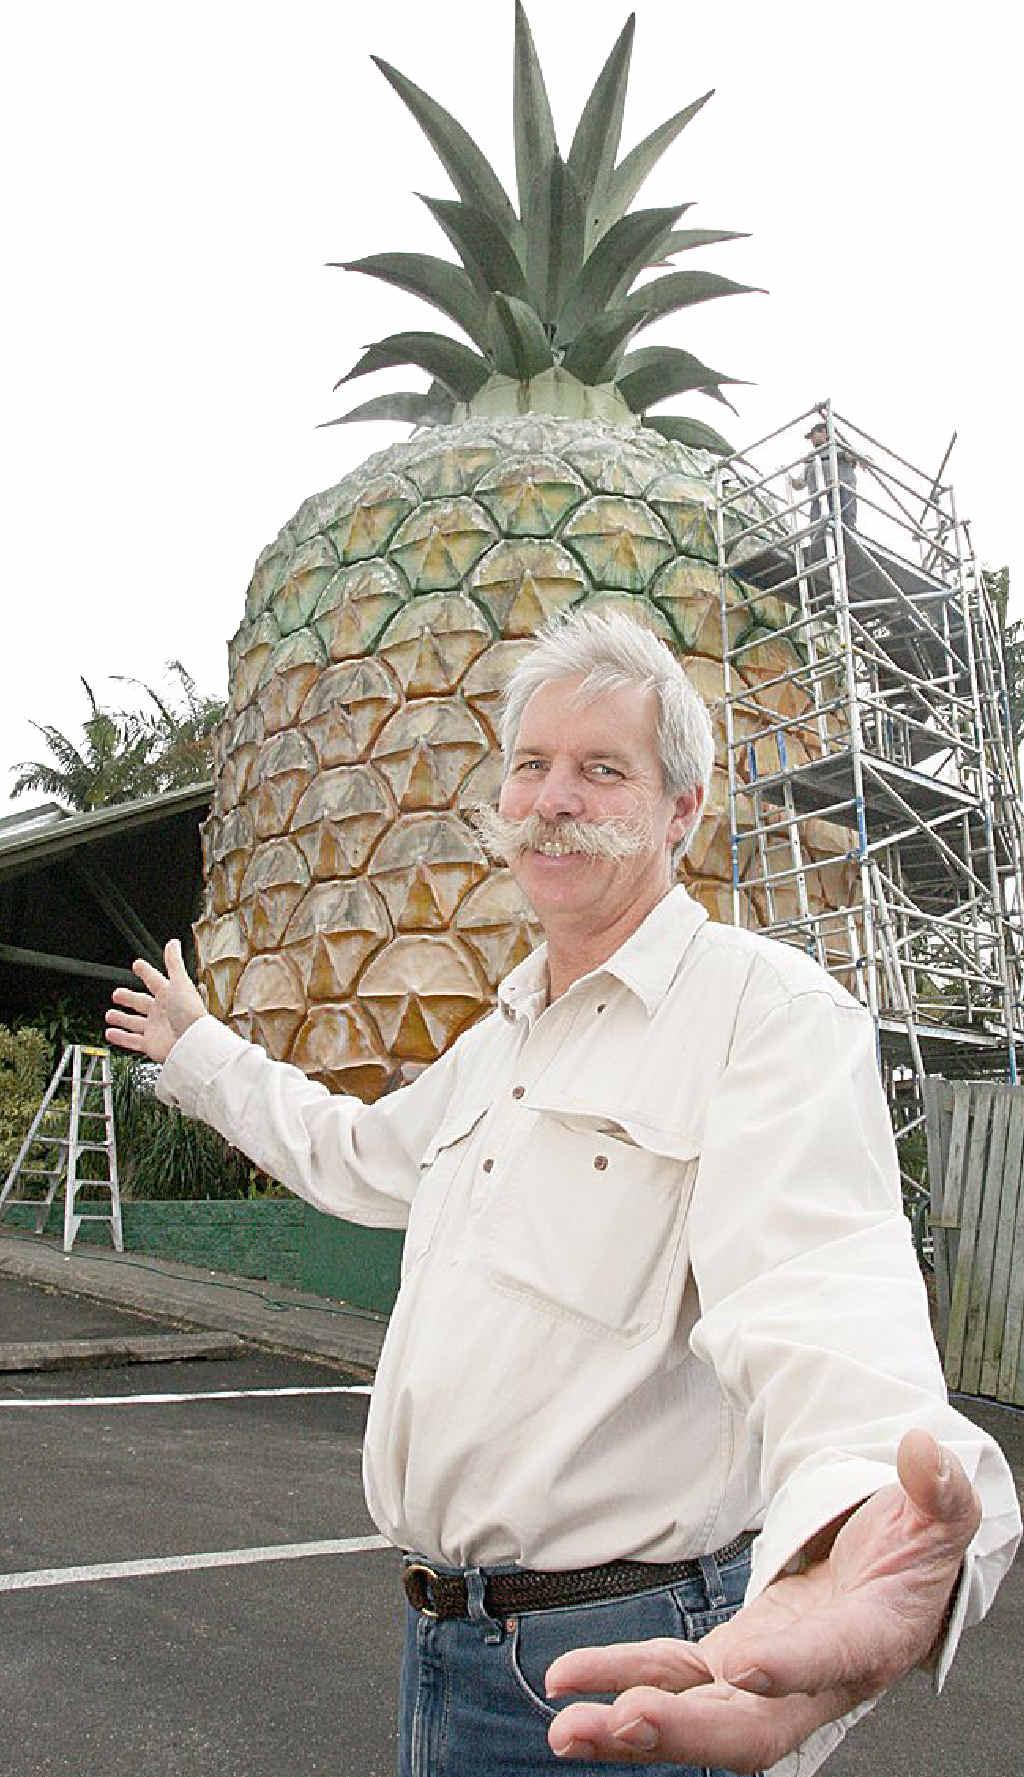 Big Pineapple general manager Paul Ziebarth